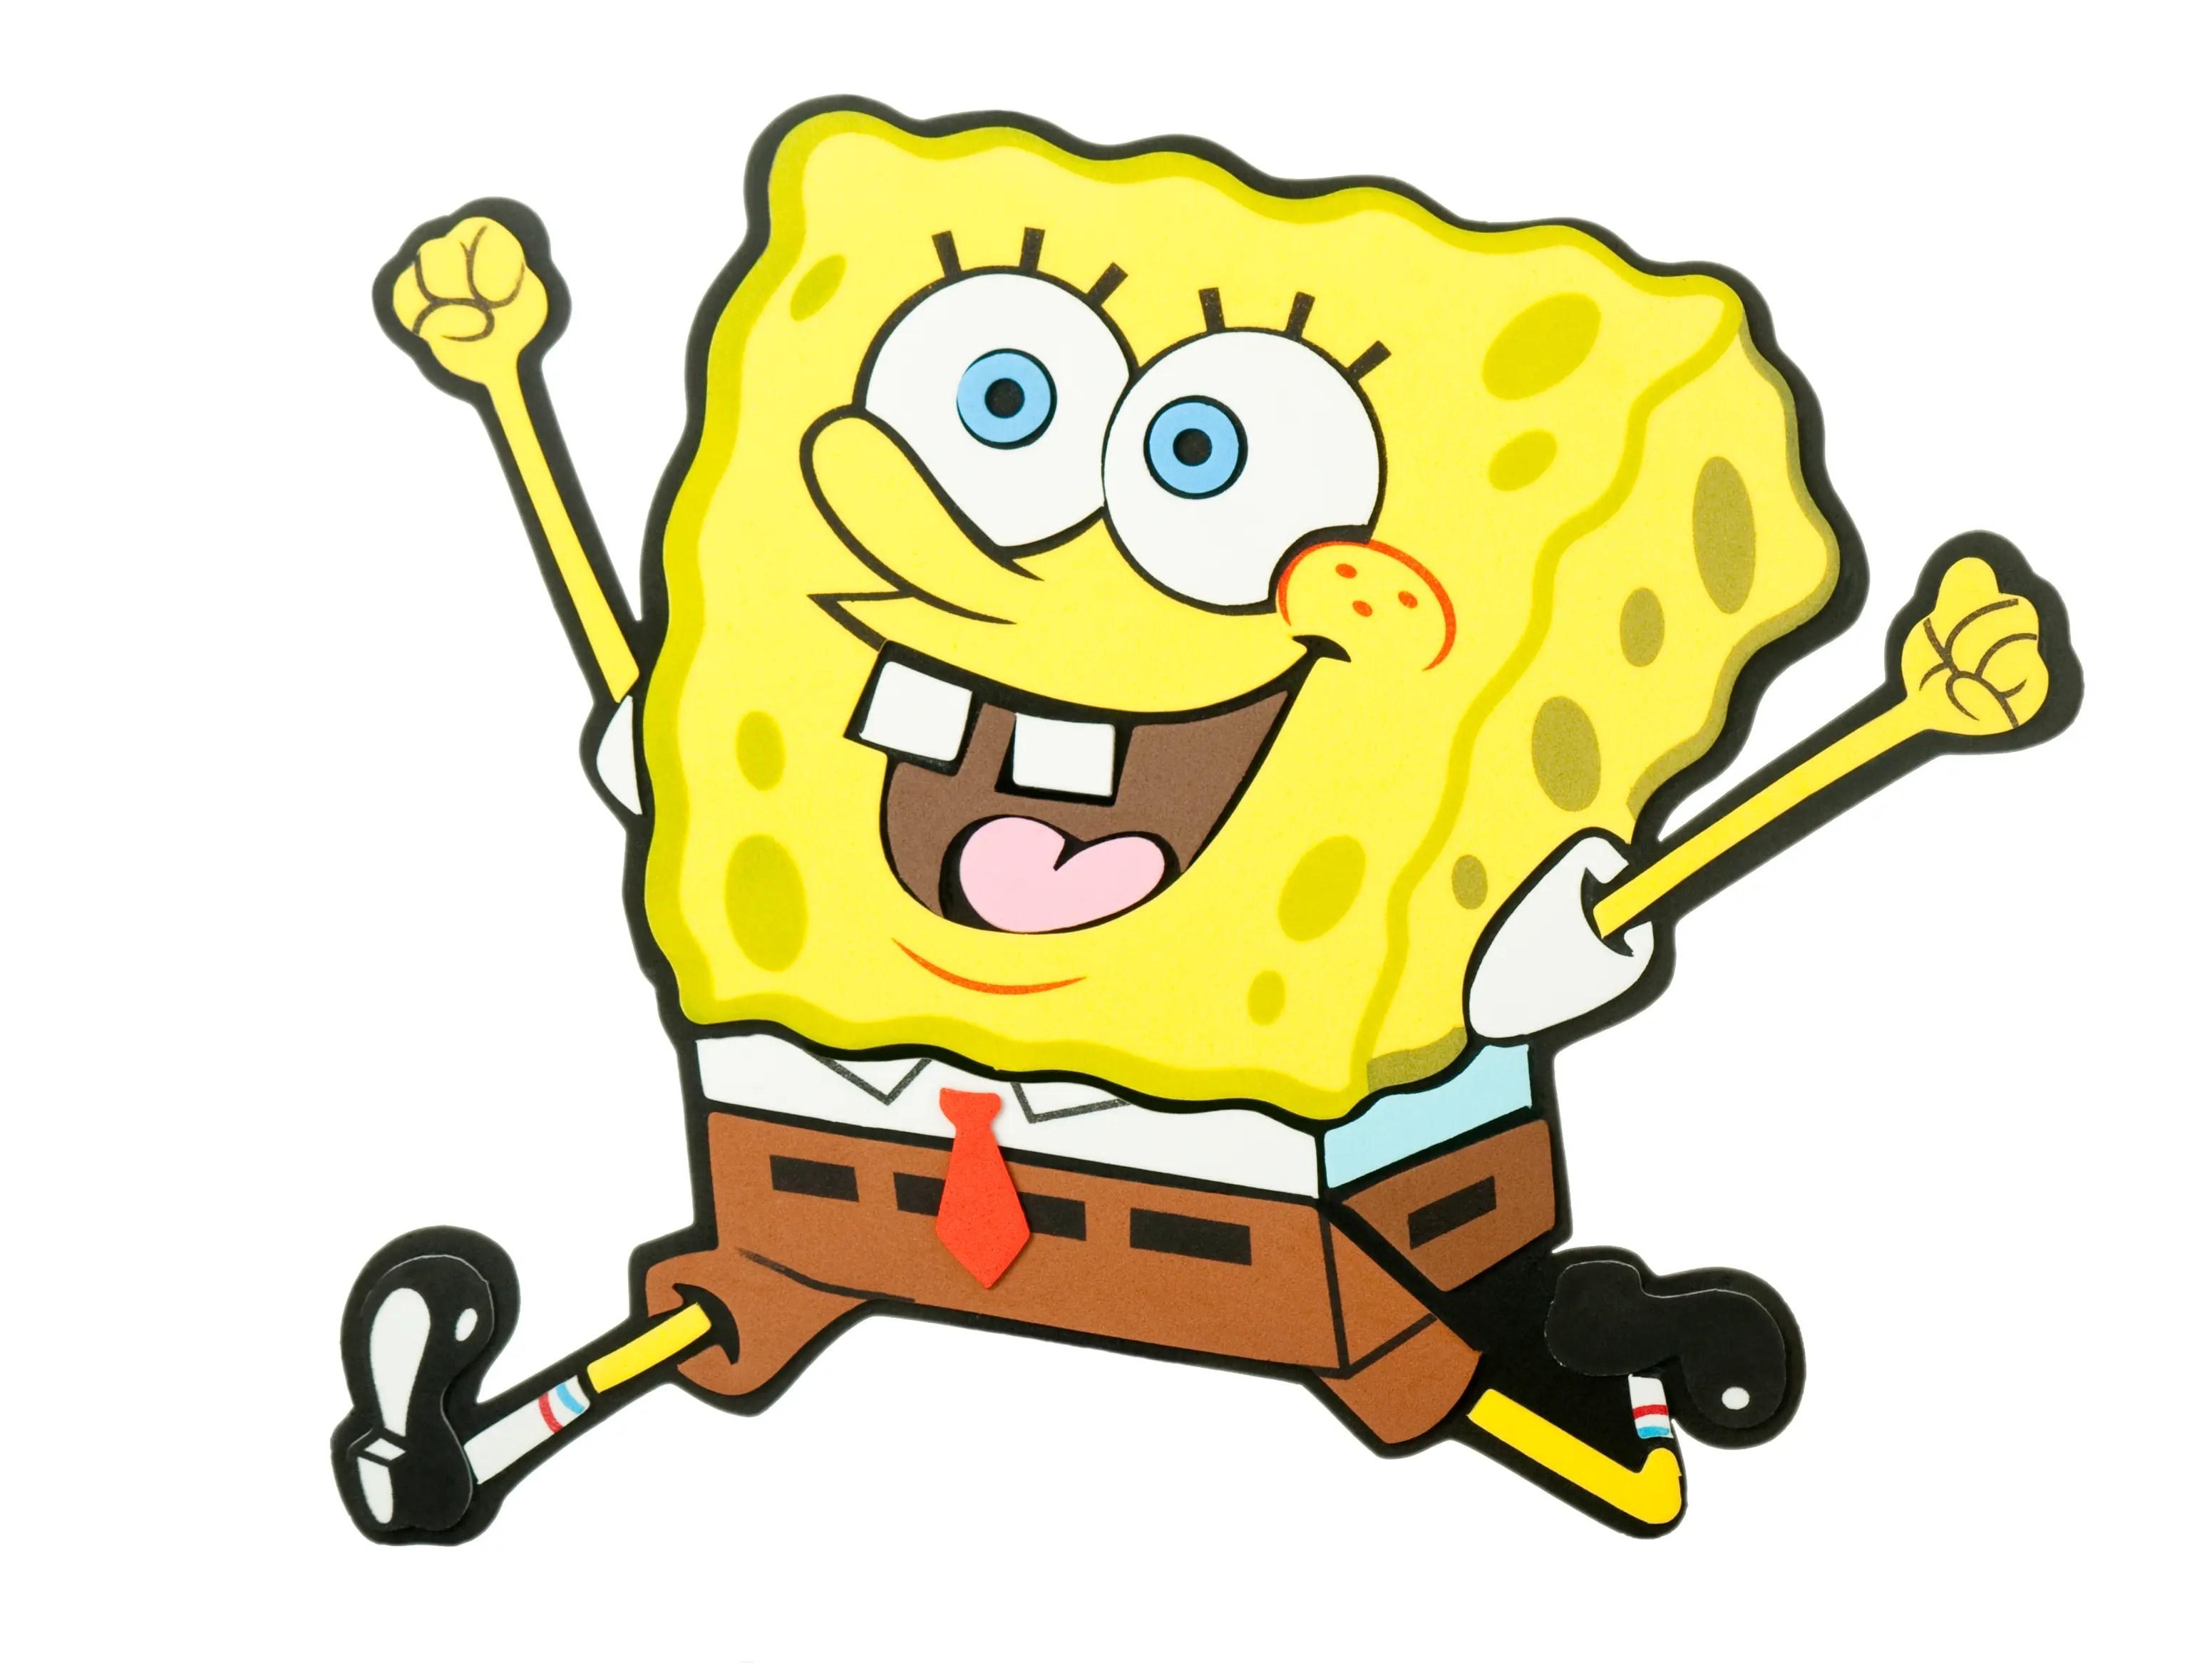 What Gender Is Spongebob Squarepants Is The Character Male Or Female